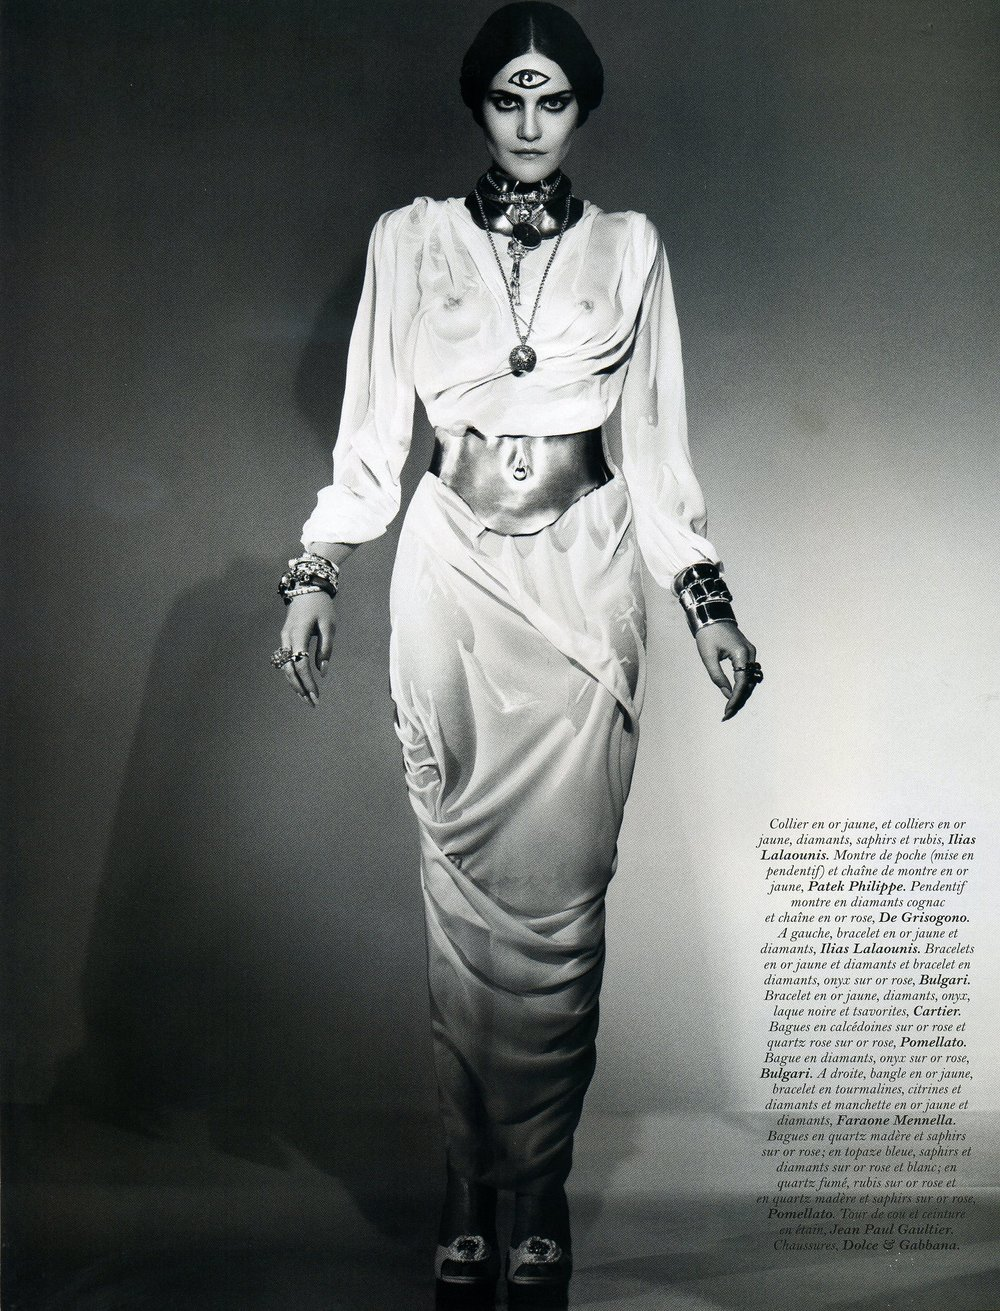 Giovanna-Battaglia-8-Audace-Manifeste-Vogue-France-Mikael-Jansson.jpg